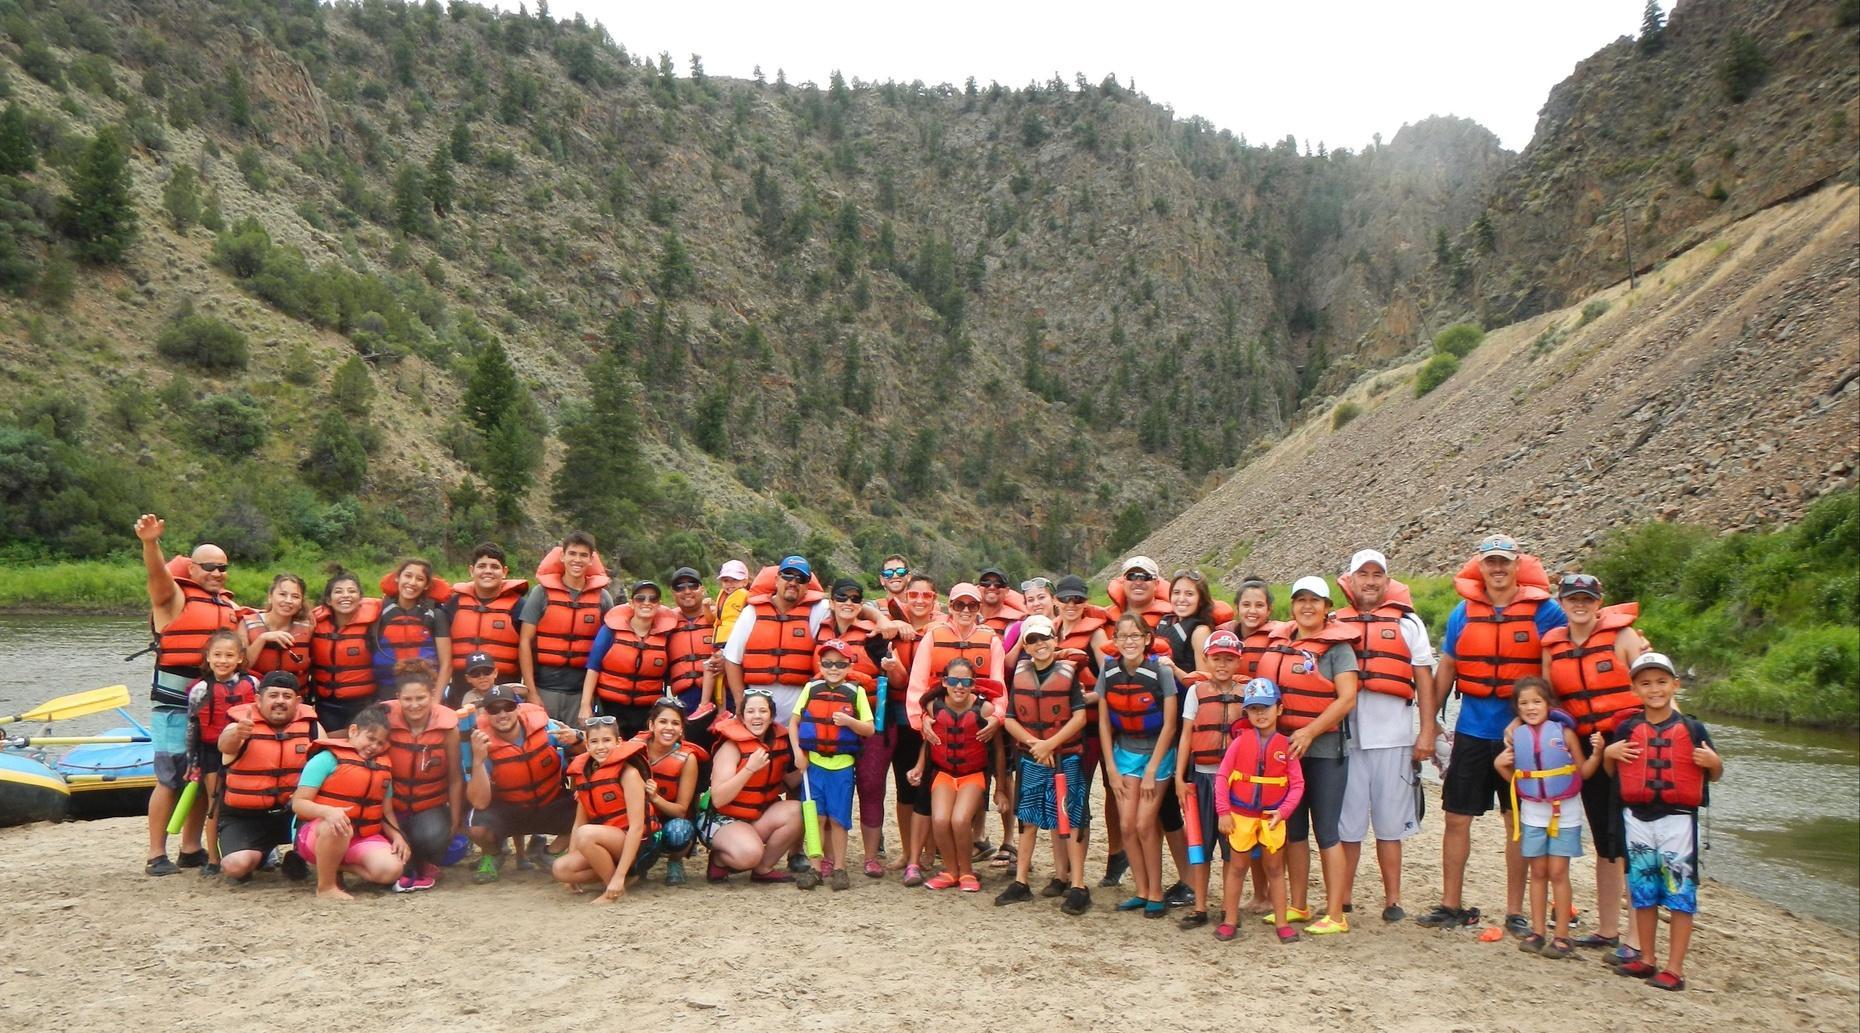 Colorado River Morning Half-Day Rafting Tour